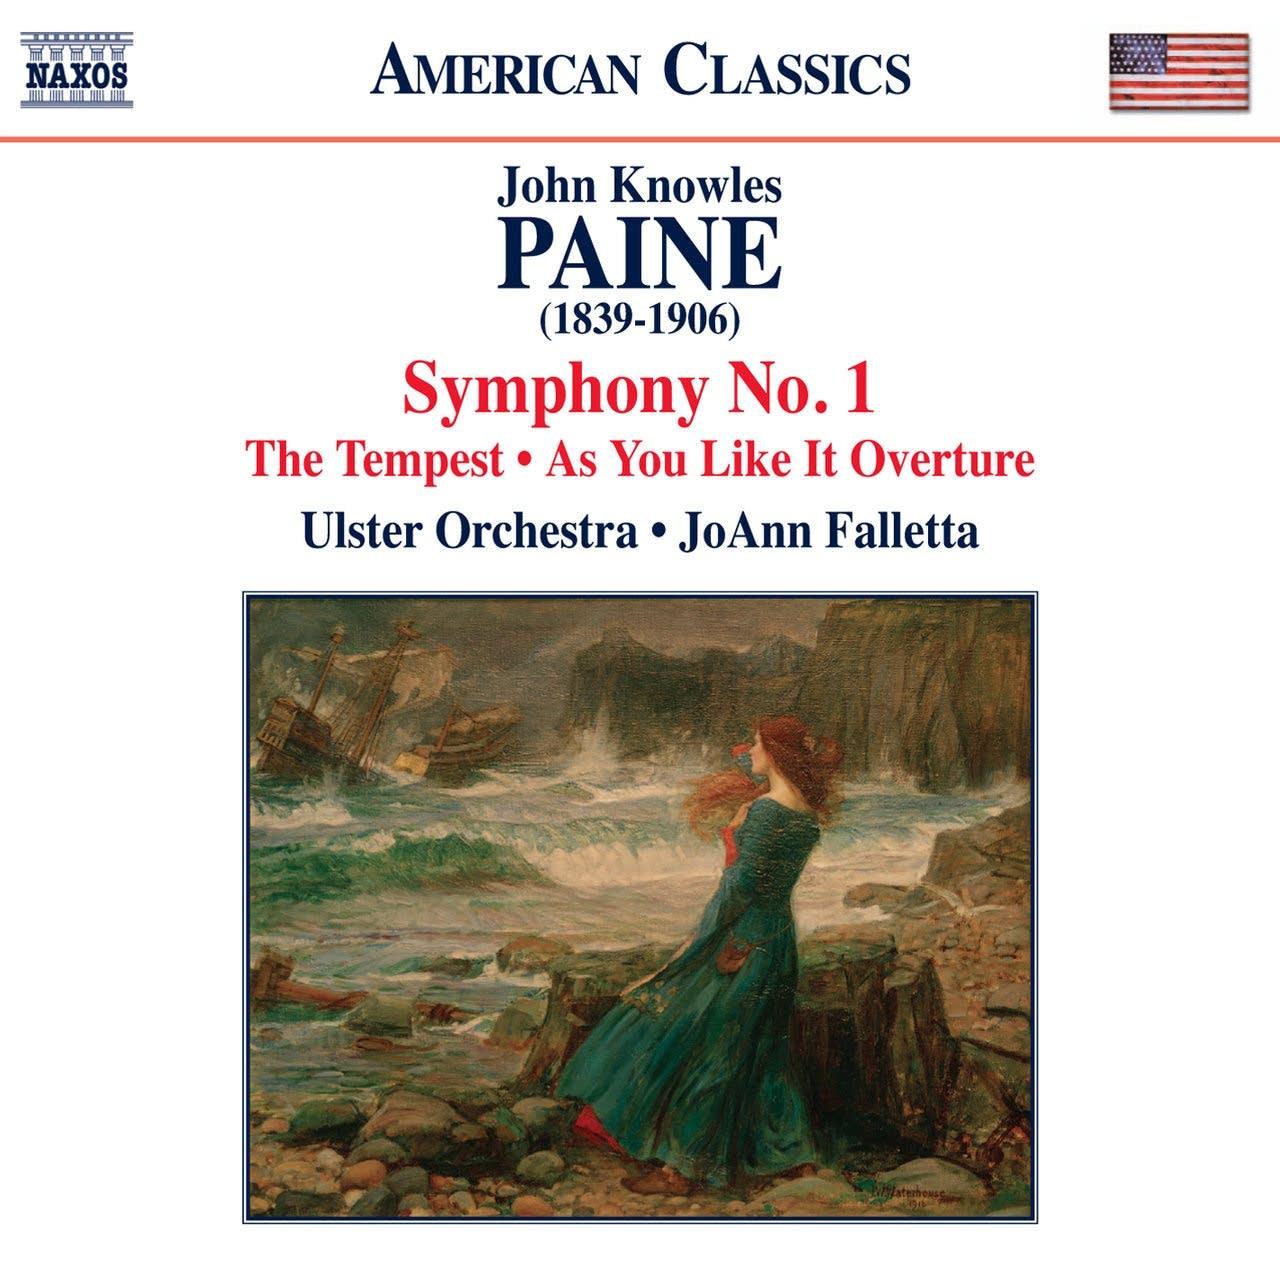 John Knowles Paine - Symphony No. 1: IV. Allegro vivace